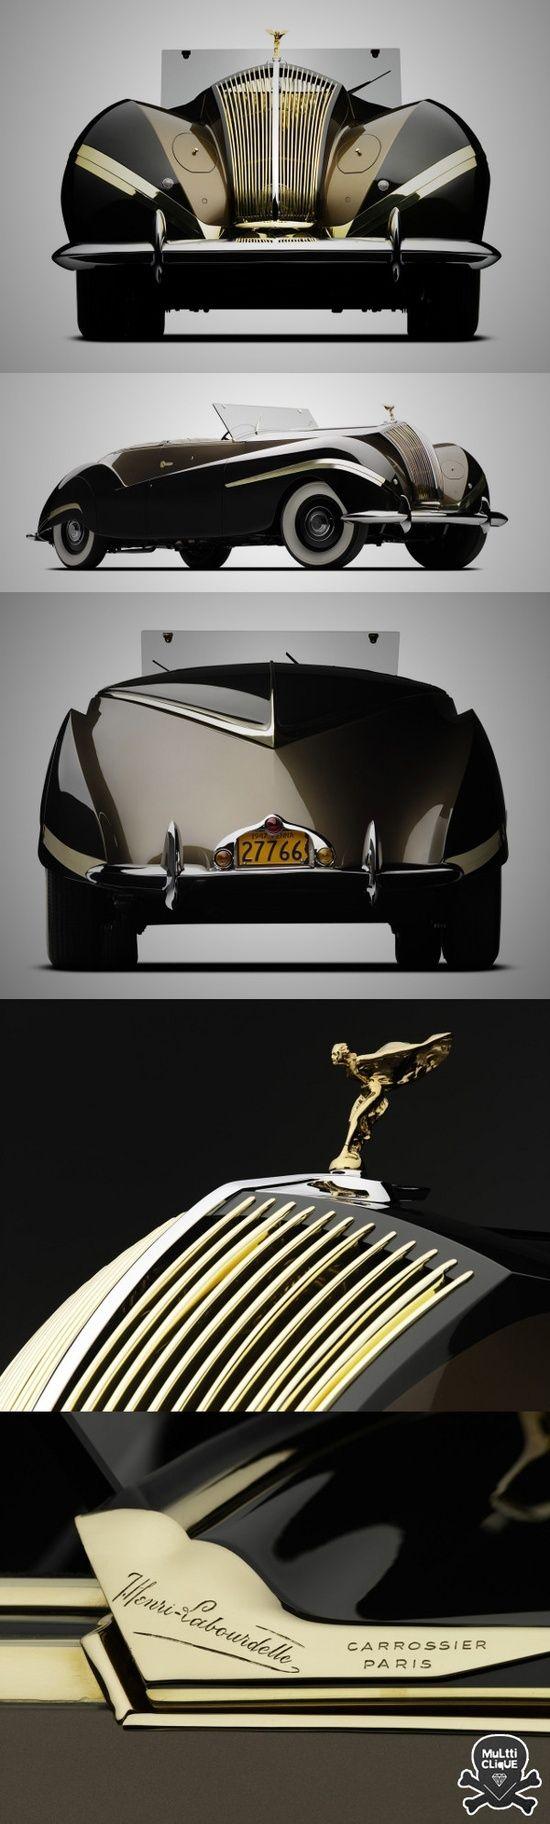 The Perfect Wedding Car 1939 Rolls Royce Phantom Iii Vutotal